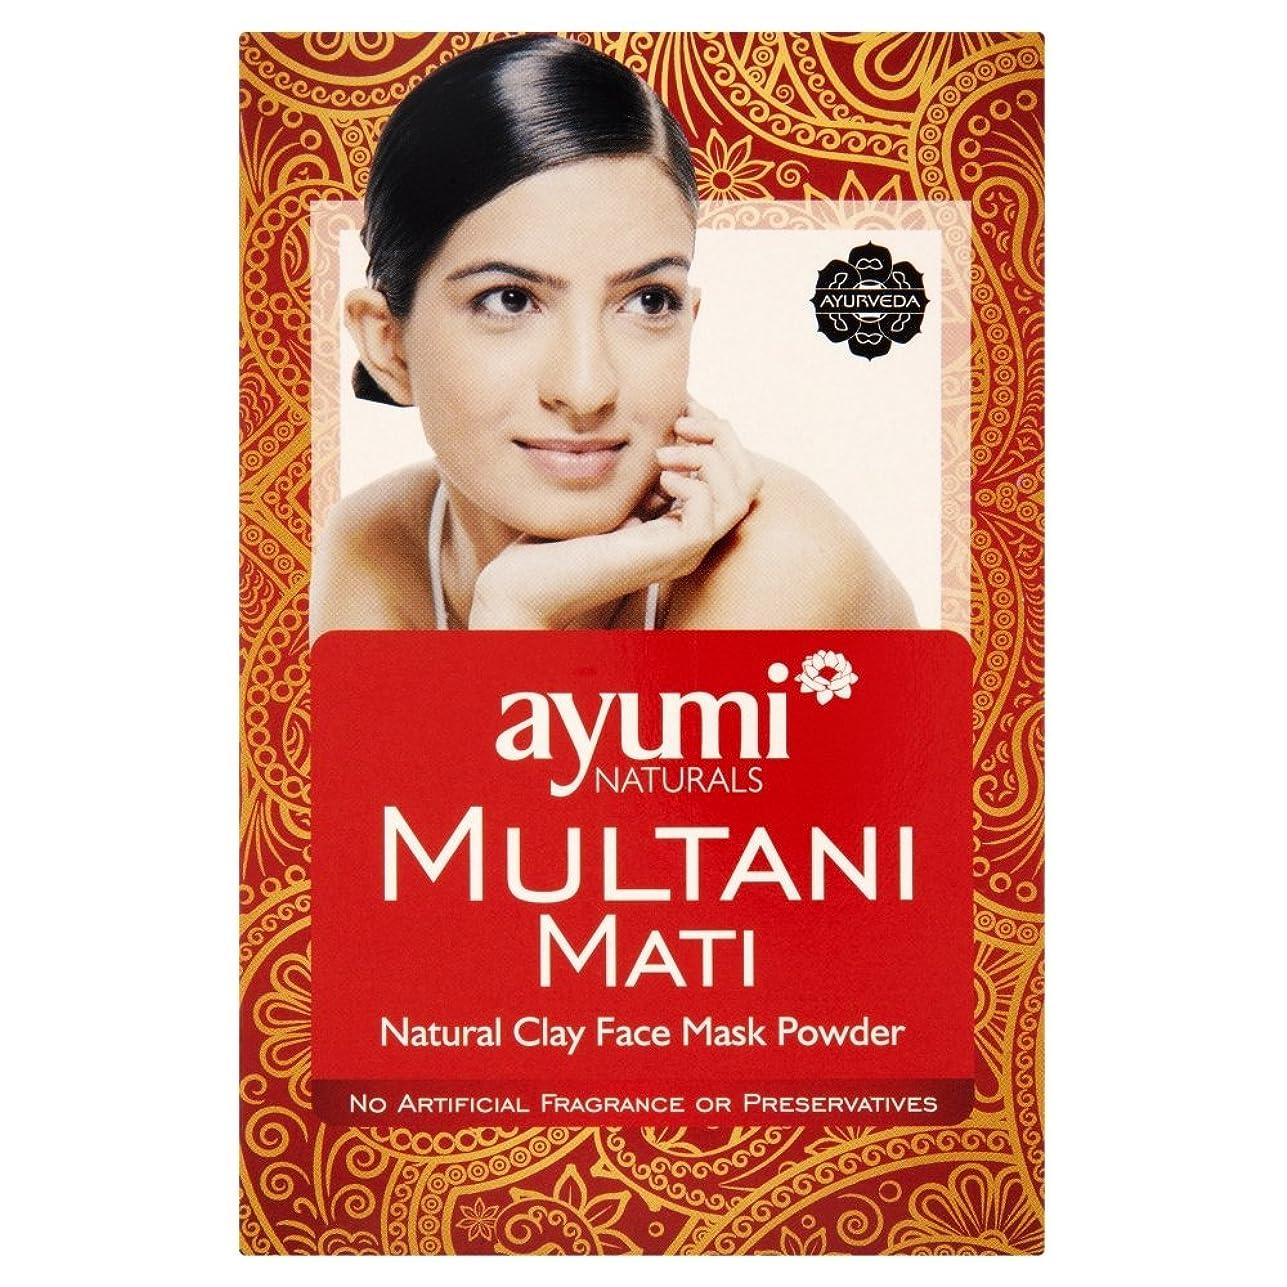 ピザ商品蛇行Ayumi Multani Mati Clay?100g